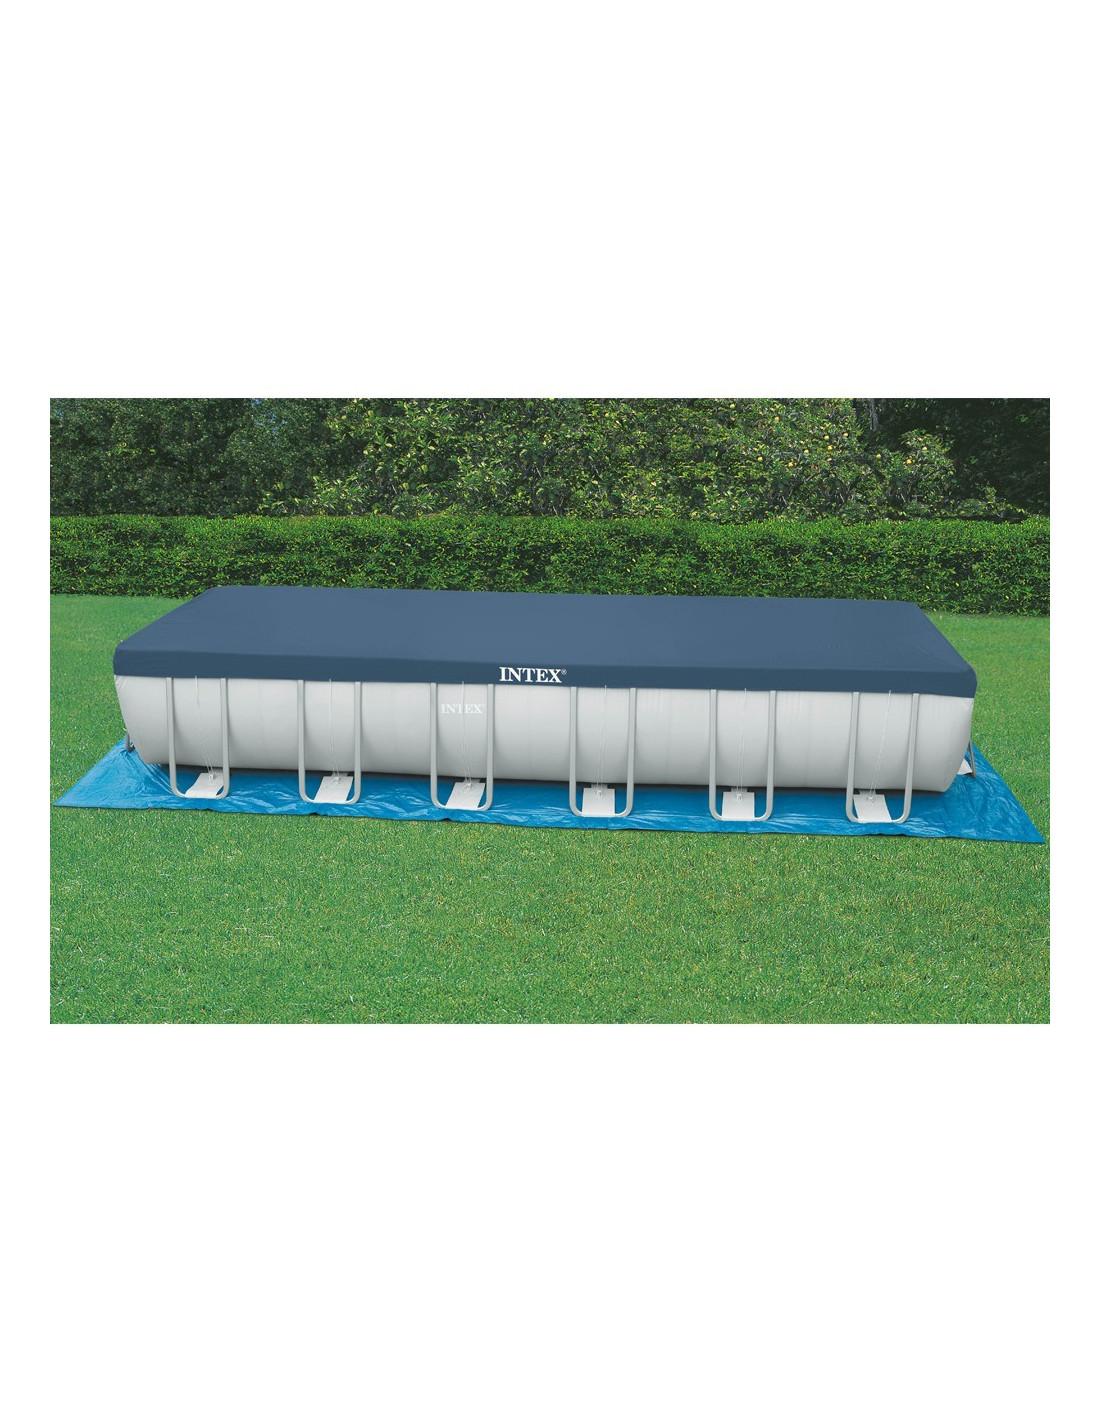 Intex kit piscine tubulaire ultra silver rectangulaire 5 - Intex piscine tubulaire rectangulaire ...